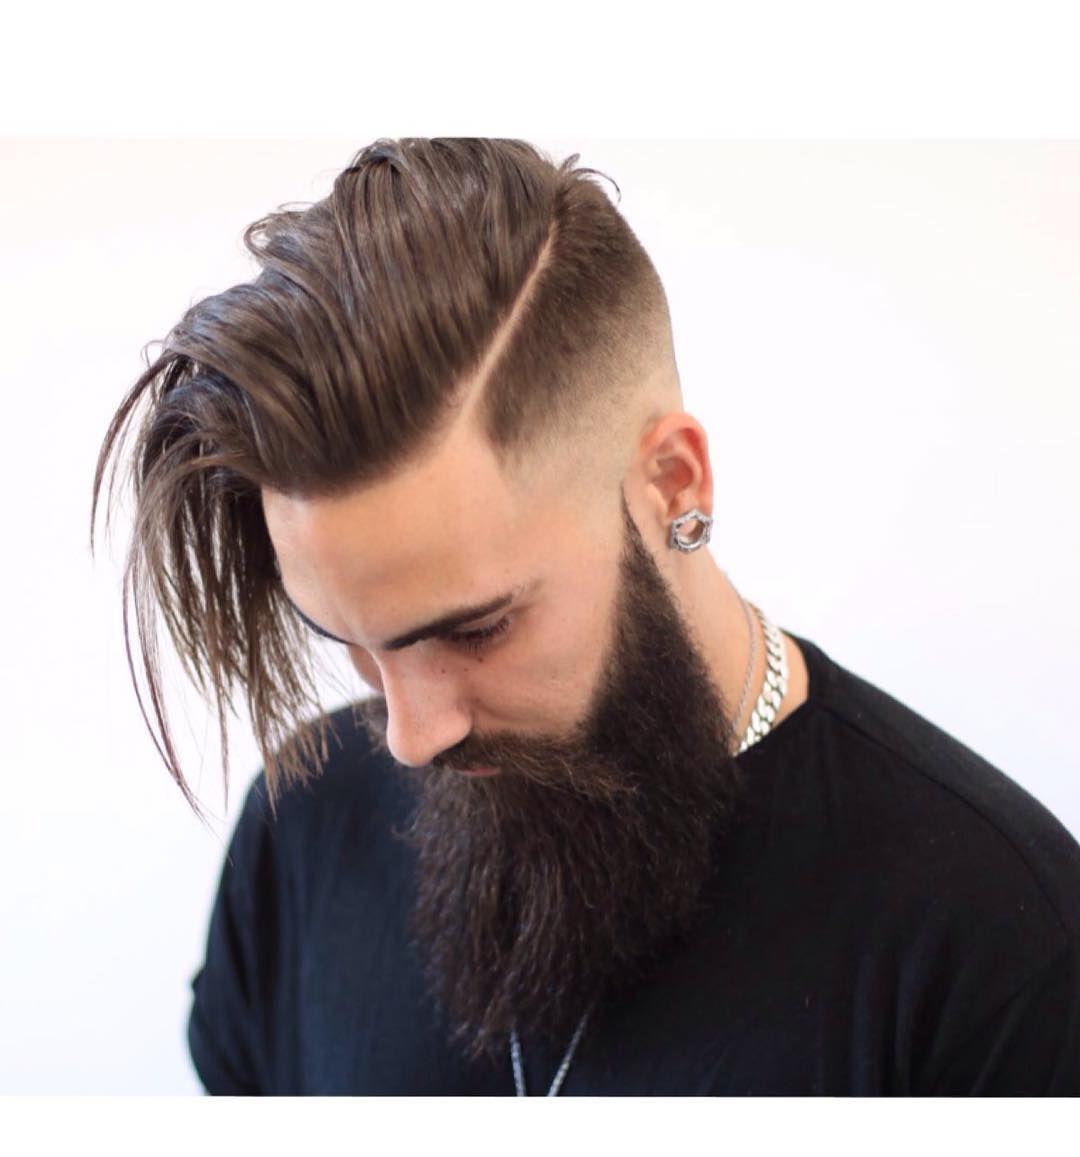 Pin By Macho Hairstyles On Trends: Пин от пользователя Macho HairStyles на доске Trends в